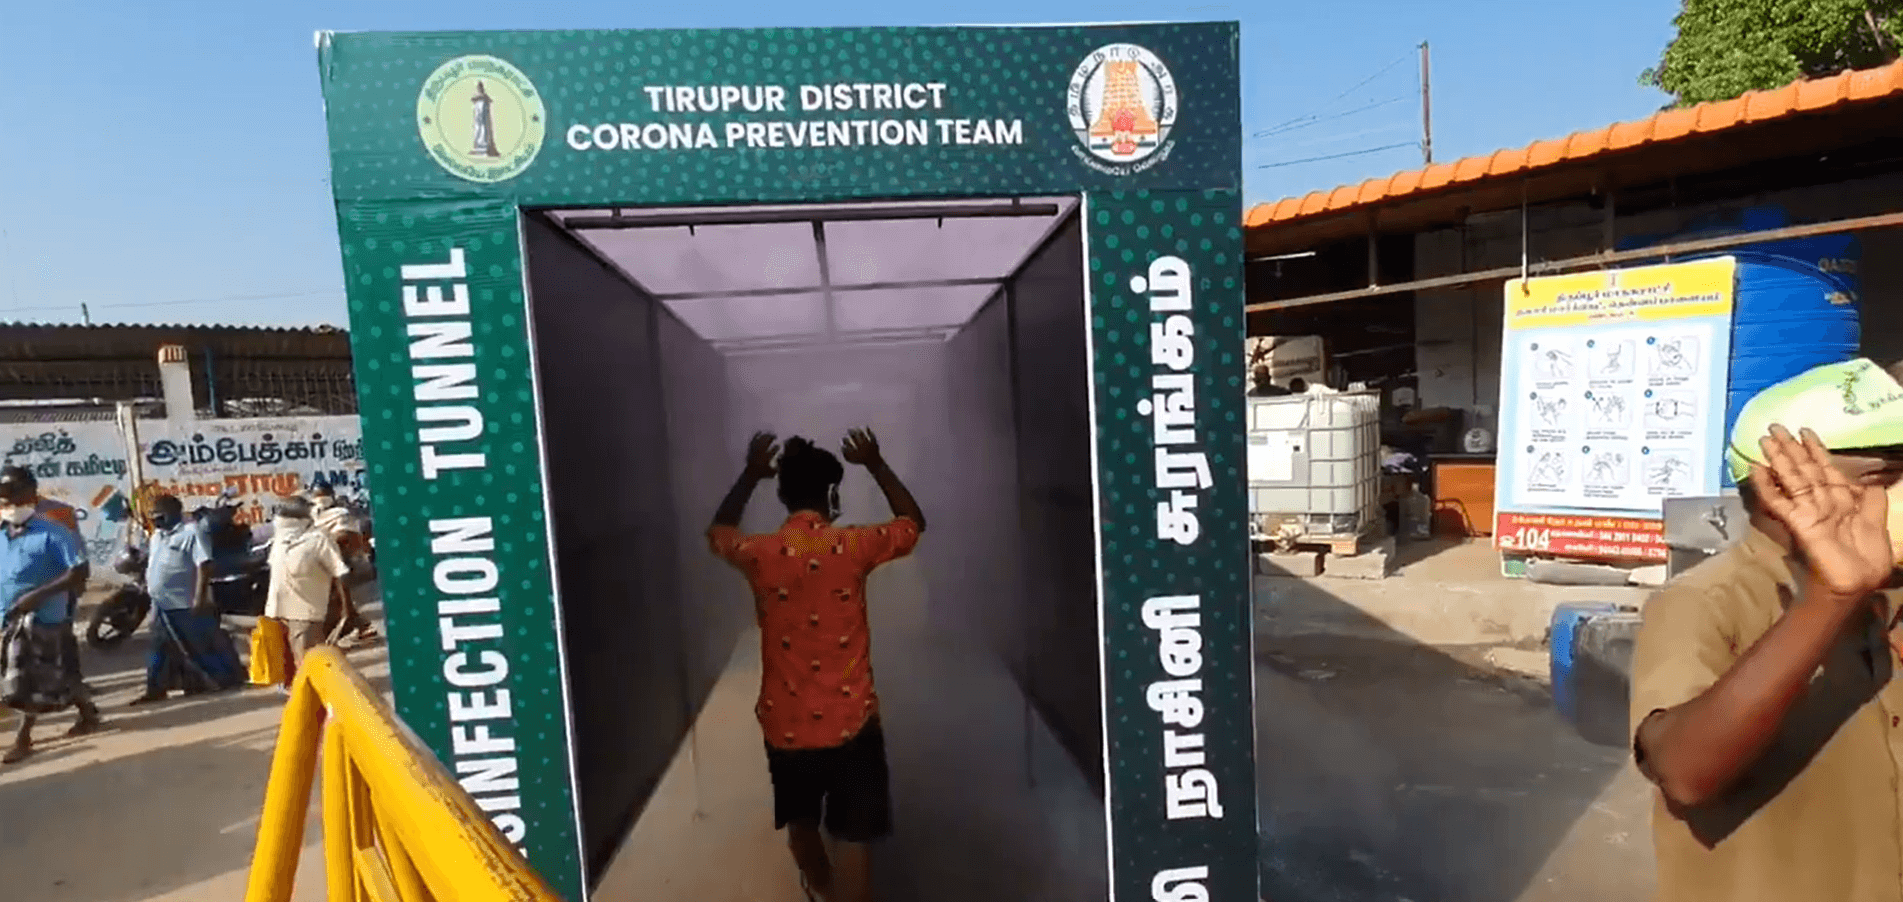 Tirupur Disinfection Tunnel